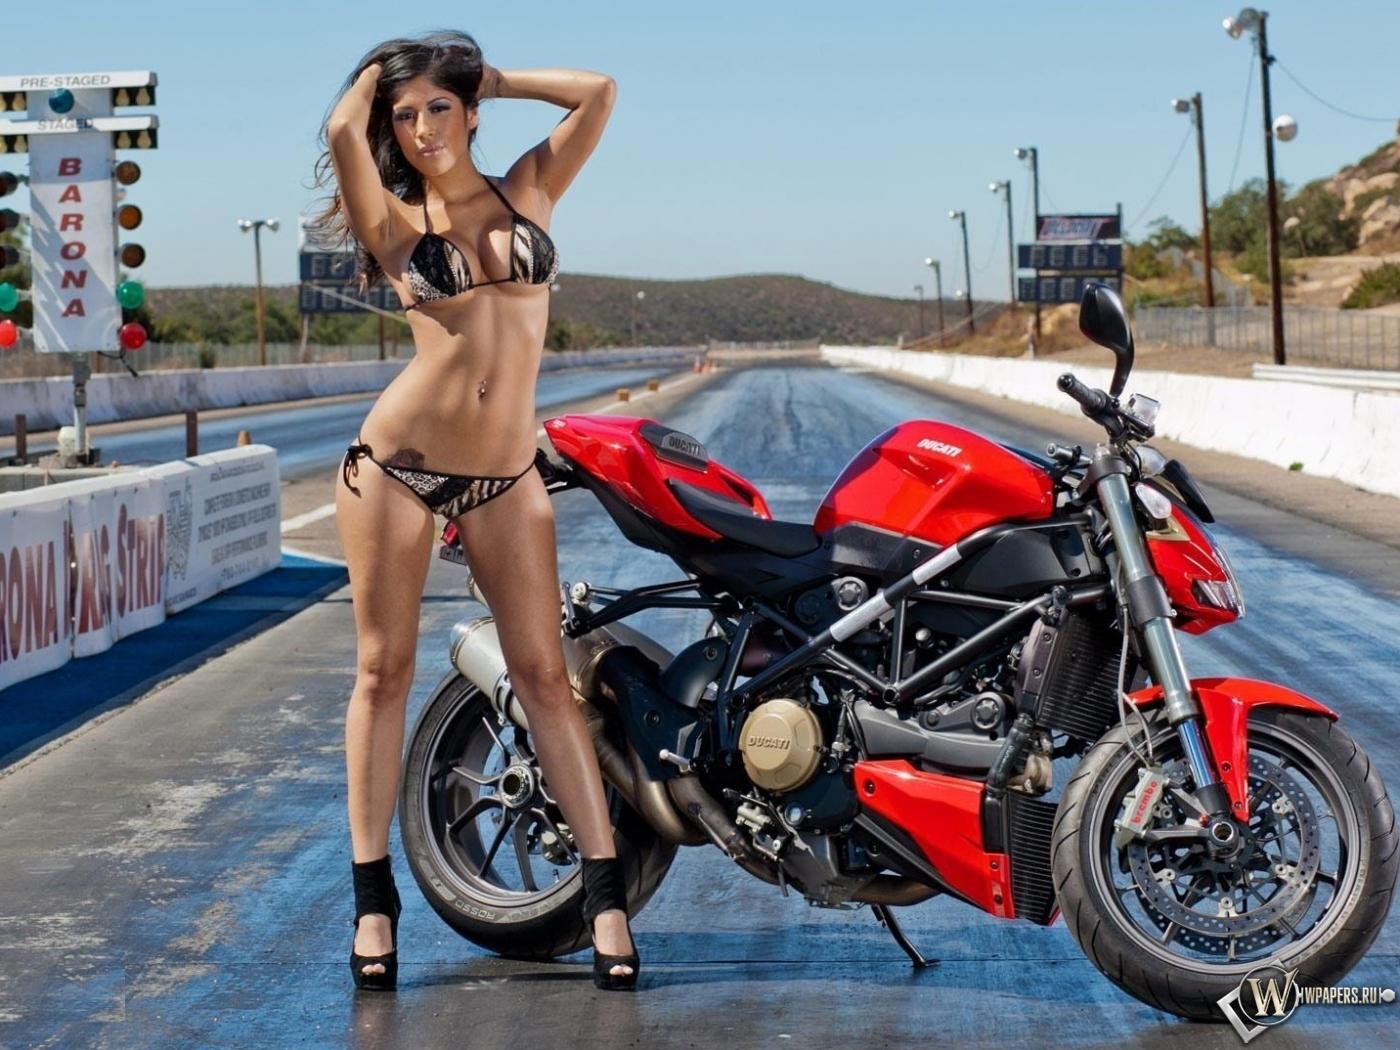 Ducati Streetfighter 1400x1050